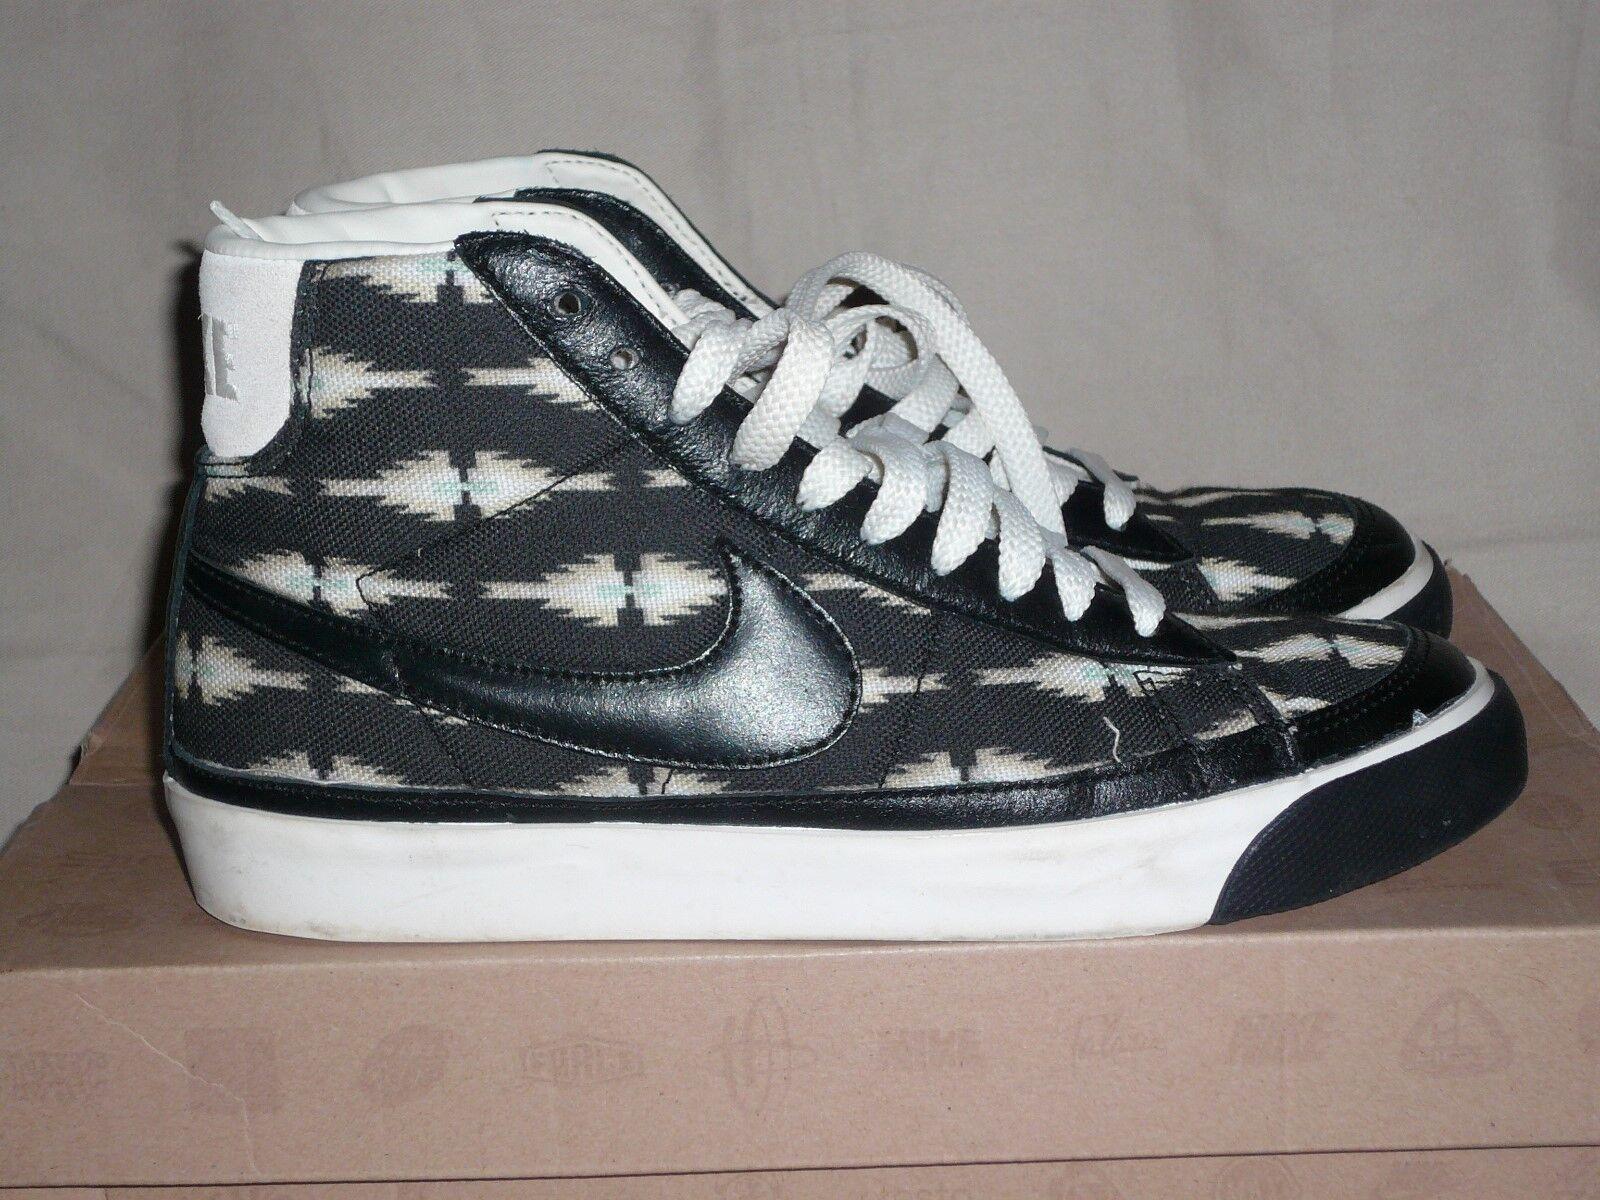 Nike Femme -375573-007 Blazer Mid, noir noir Baskets Turnchaussures UK 5